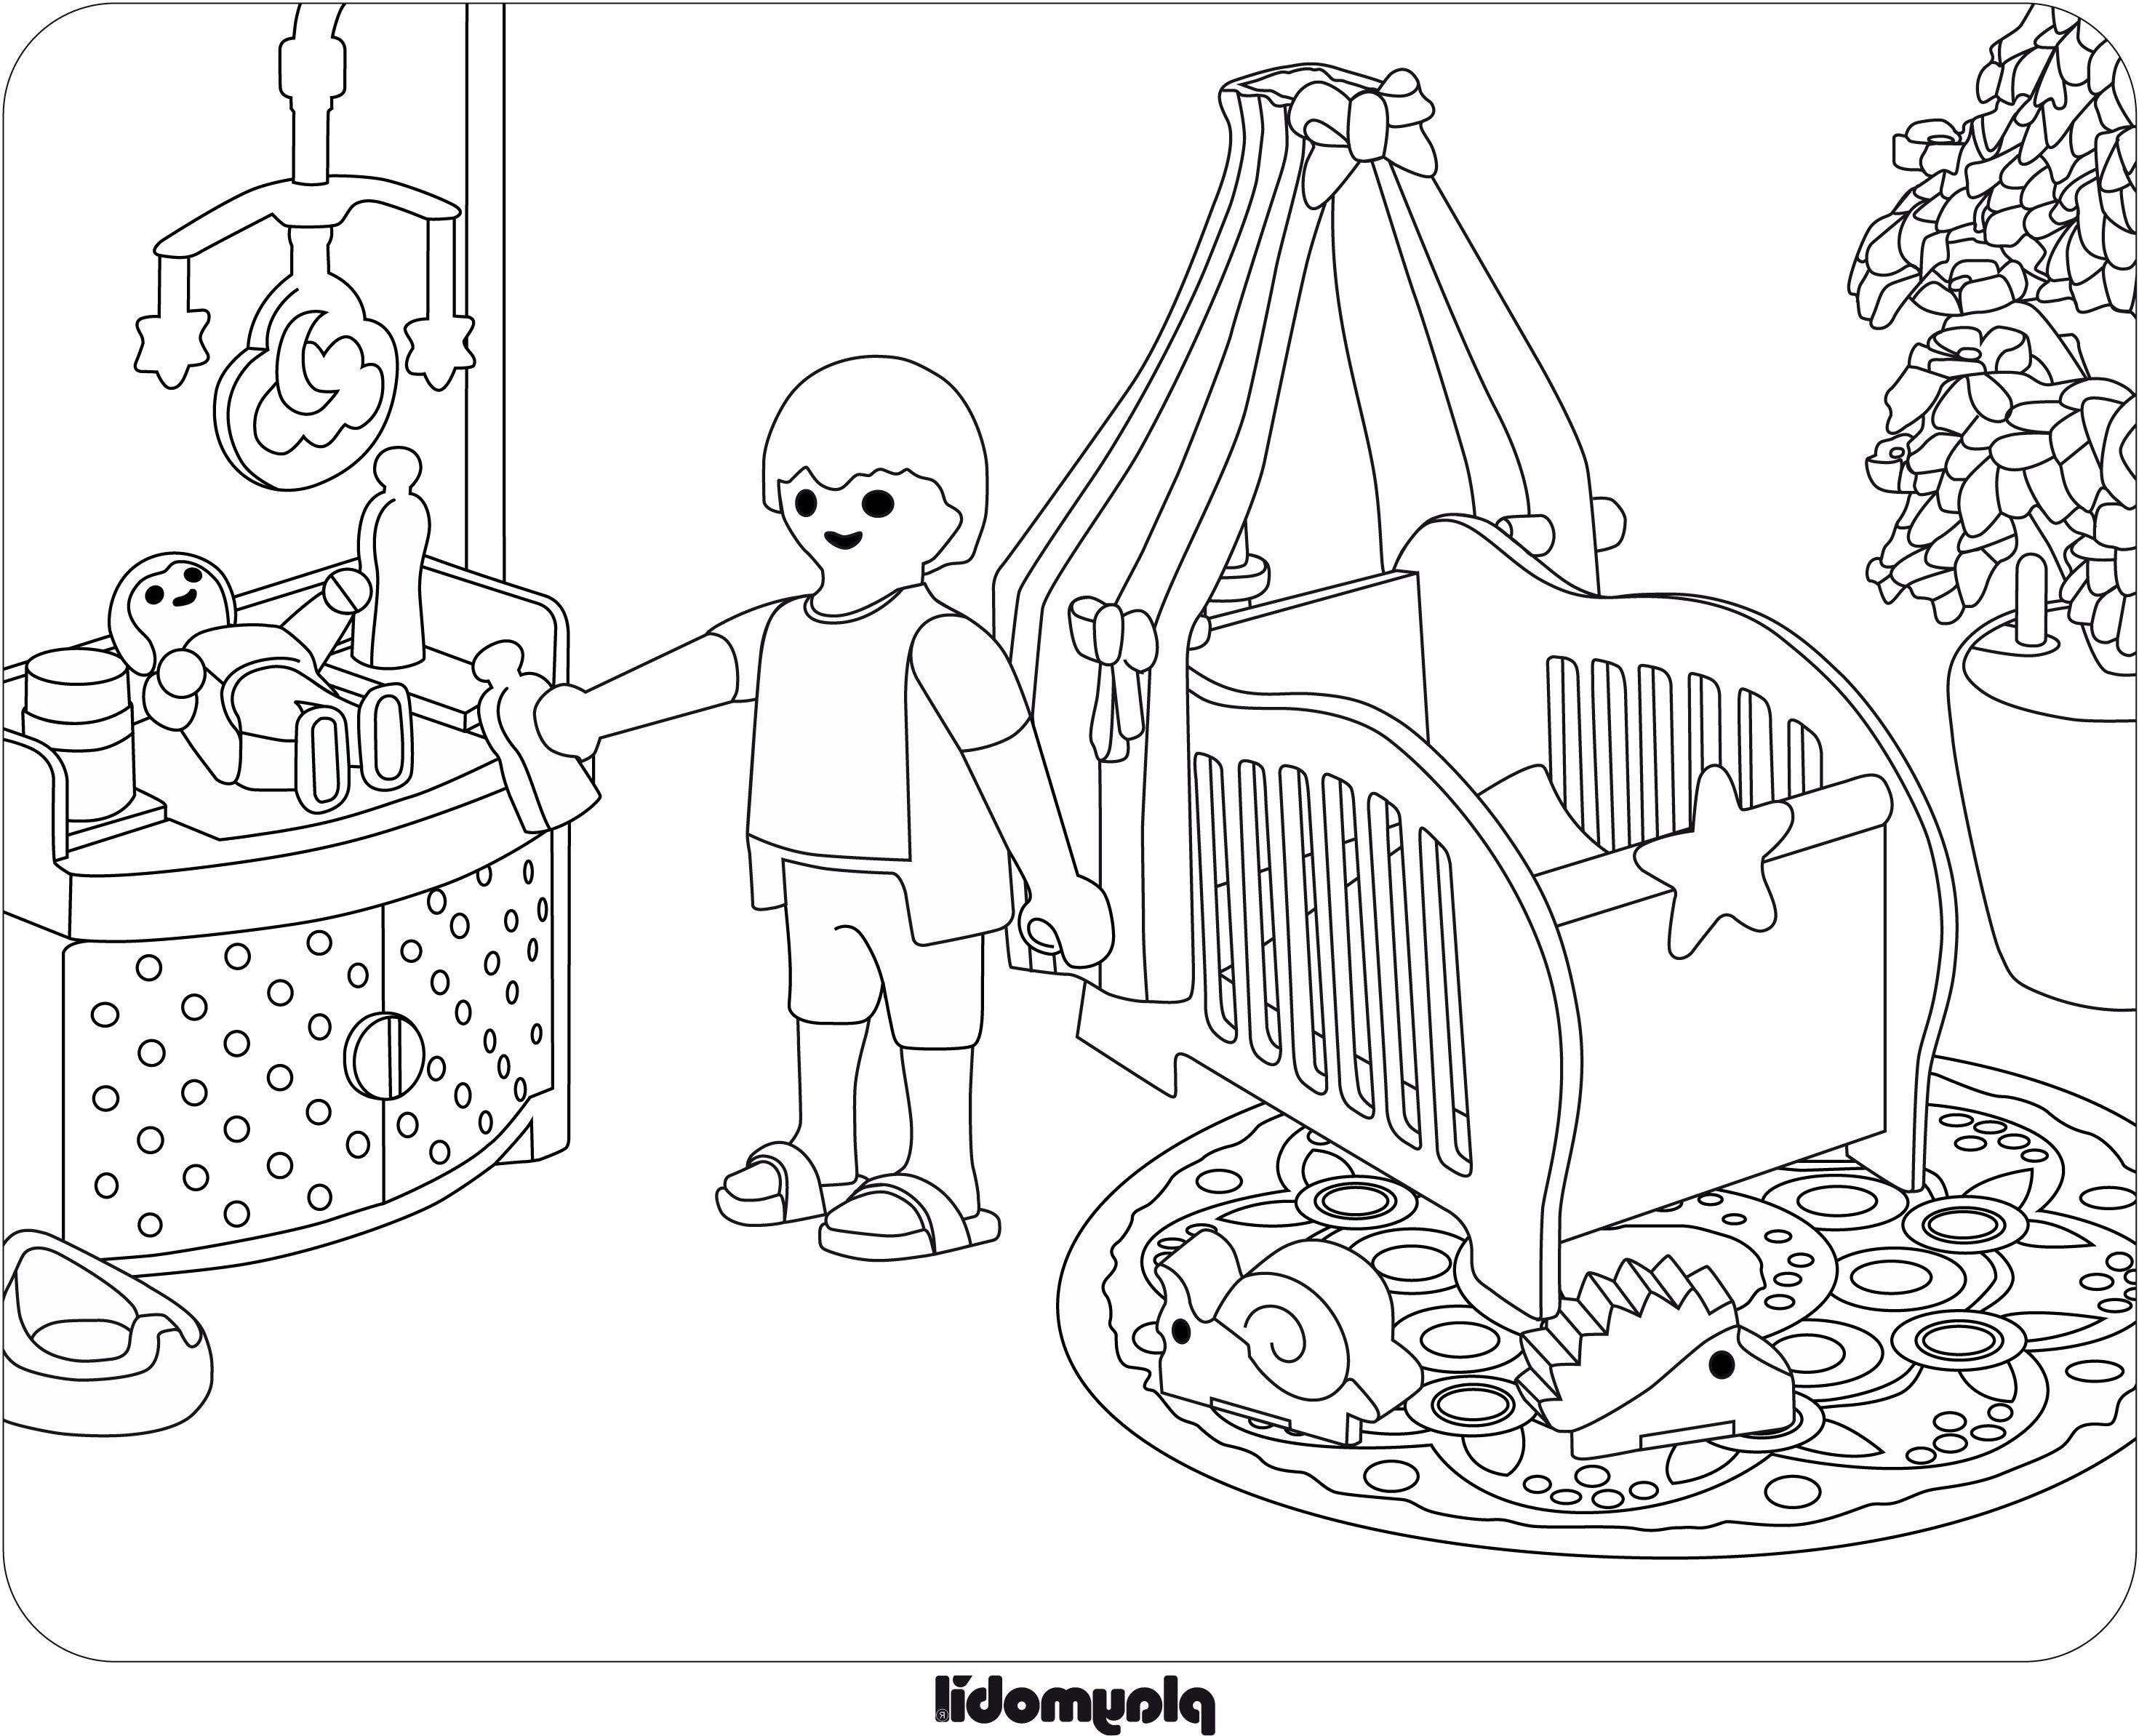 Playmobil Ausmalbilder K He   Aiquruguay